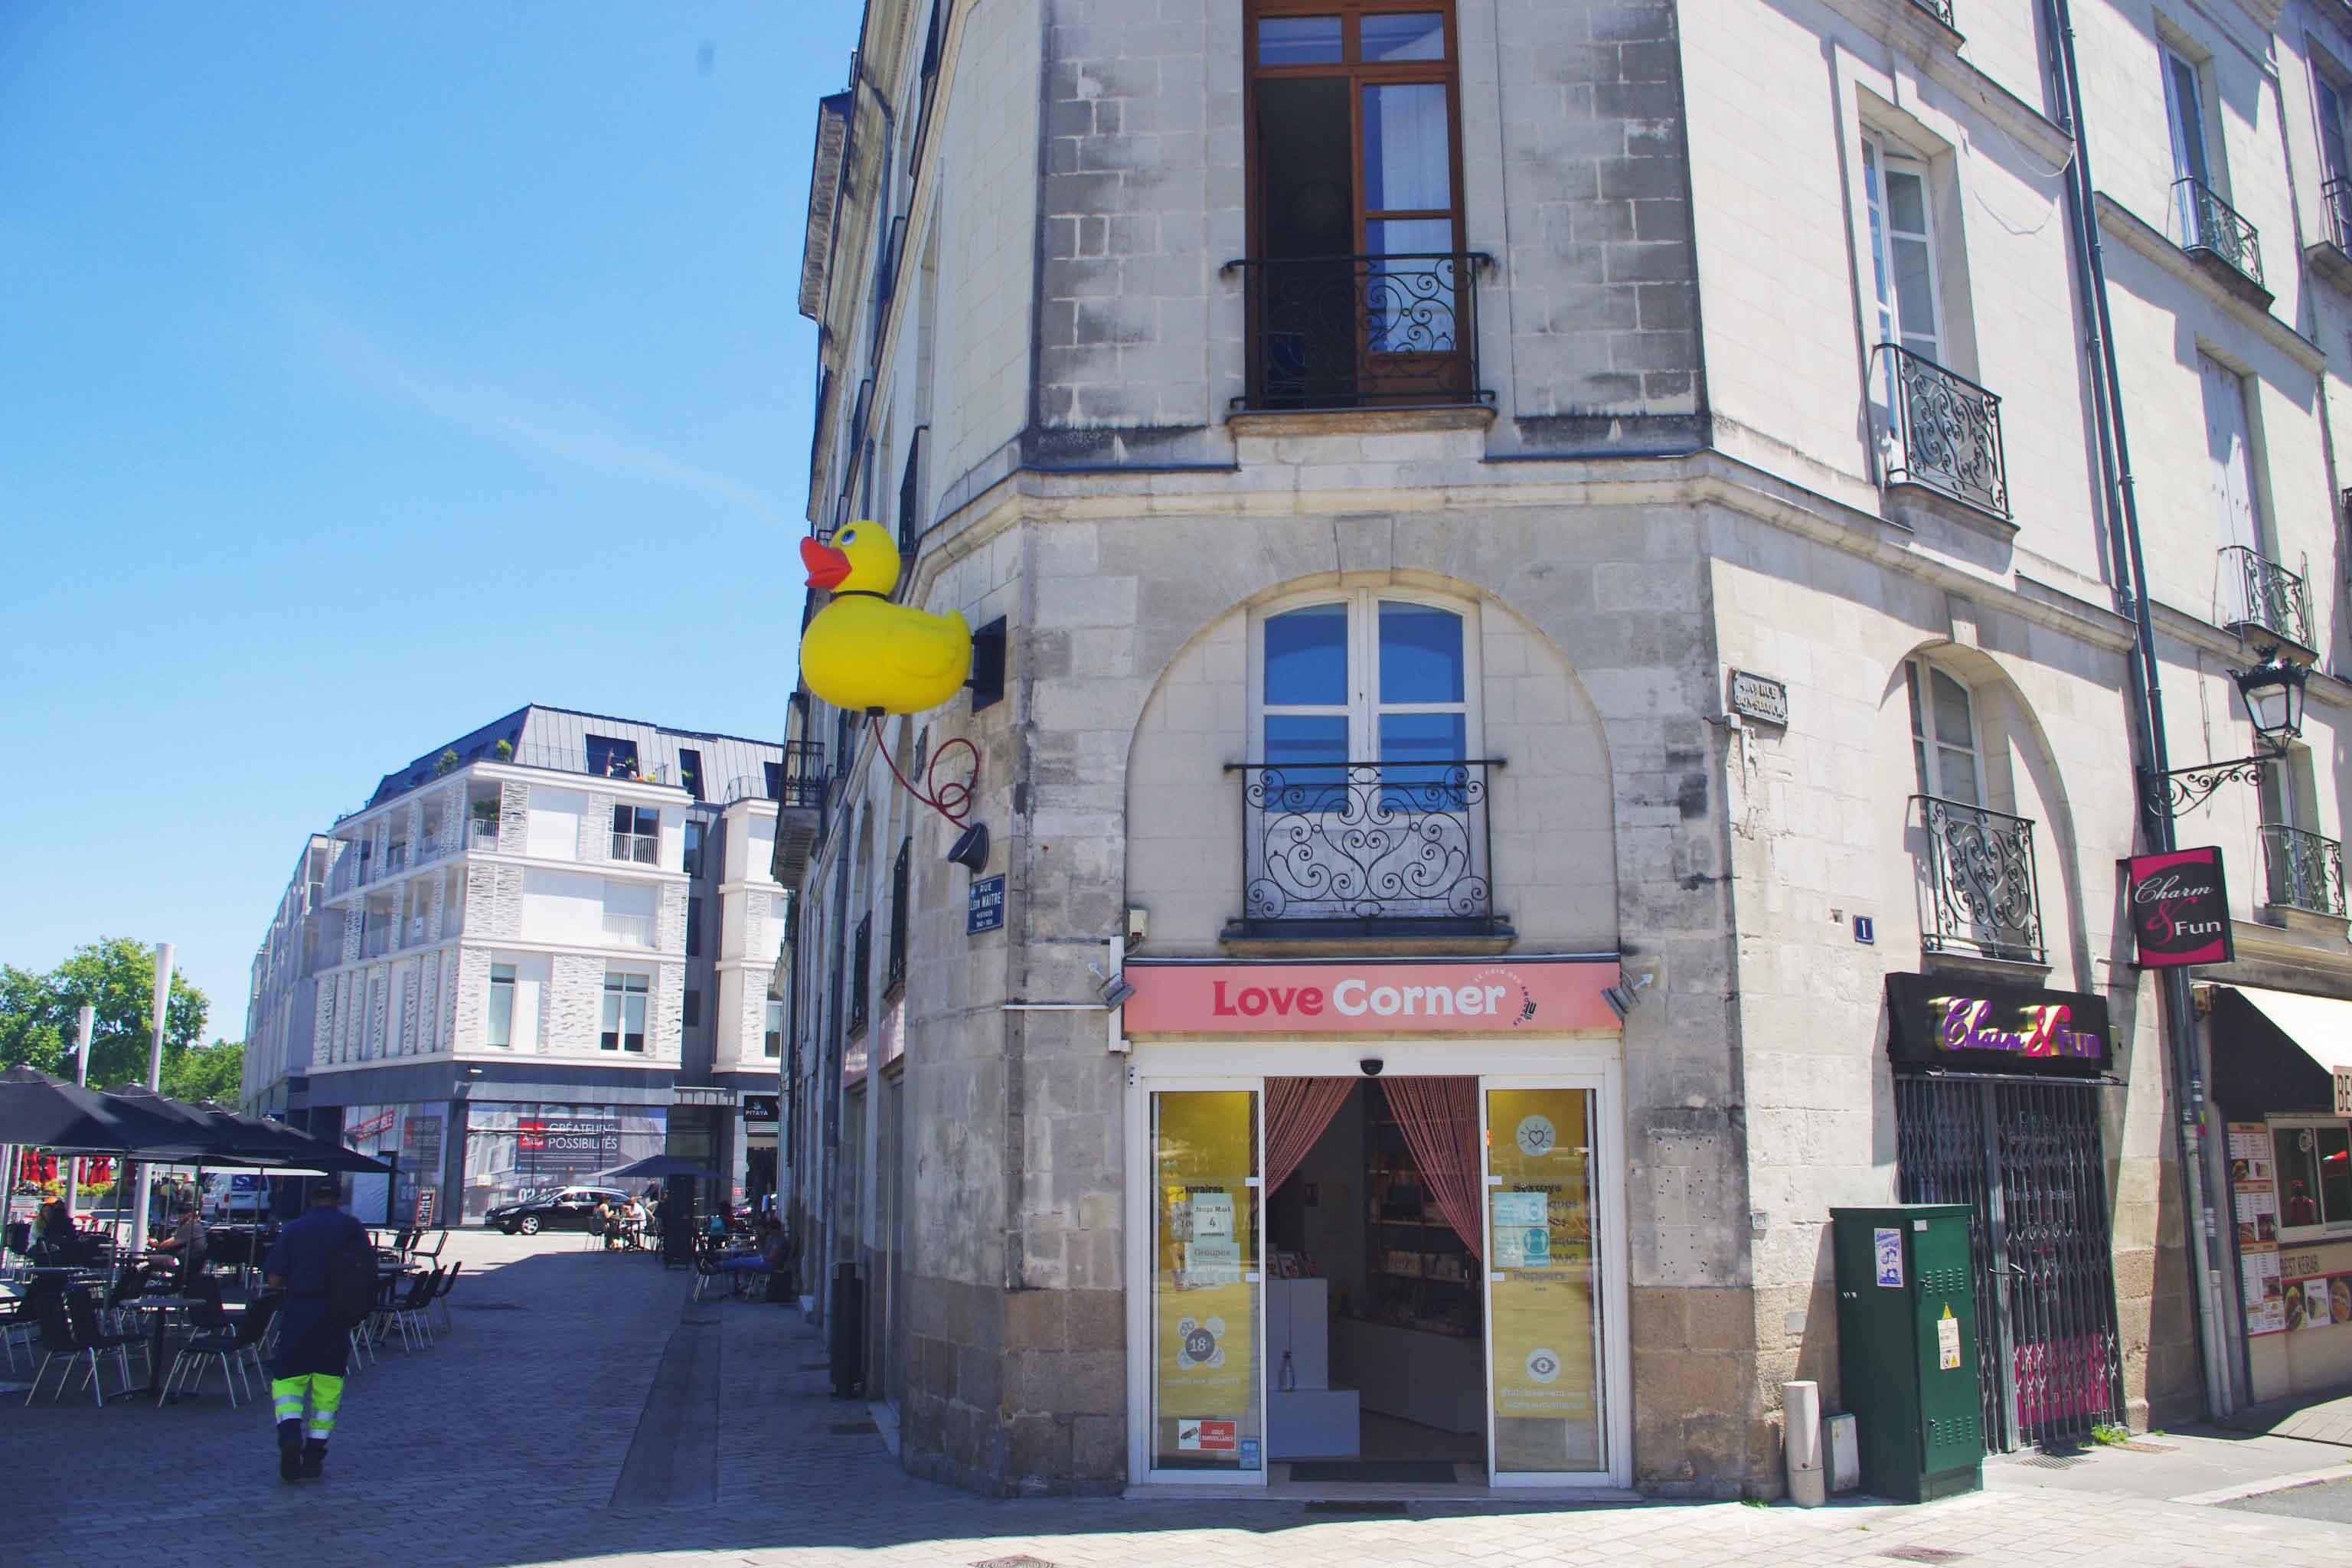 Gelbe Ente vor dem Geschäft «Love Corner» in Nantes